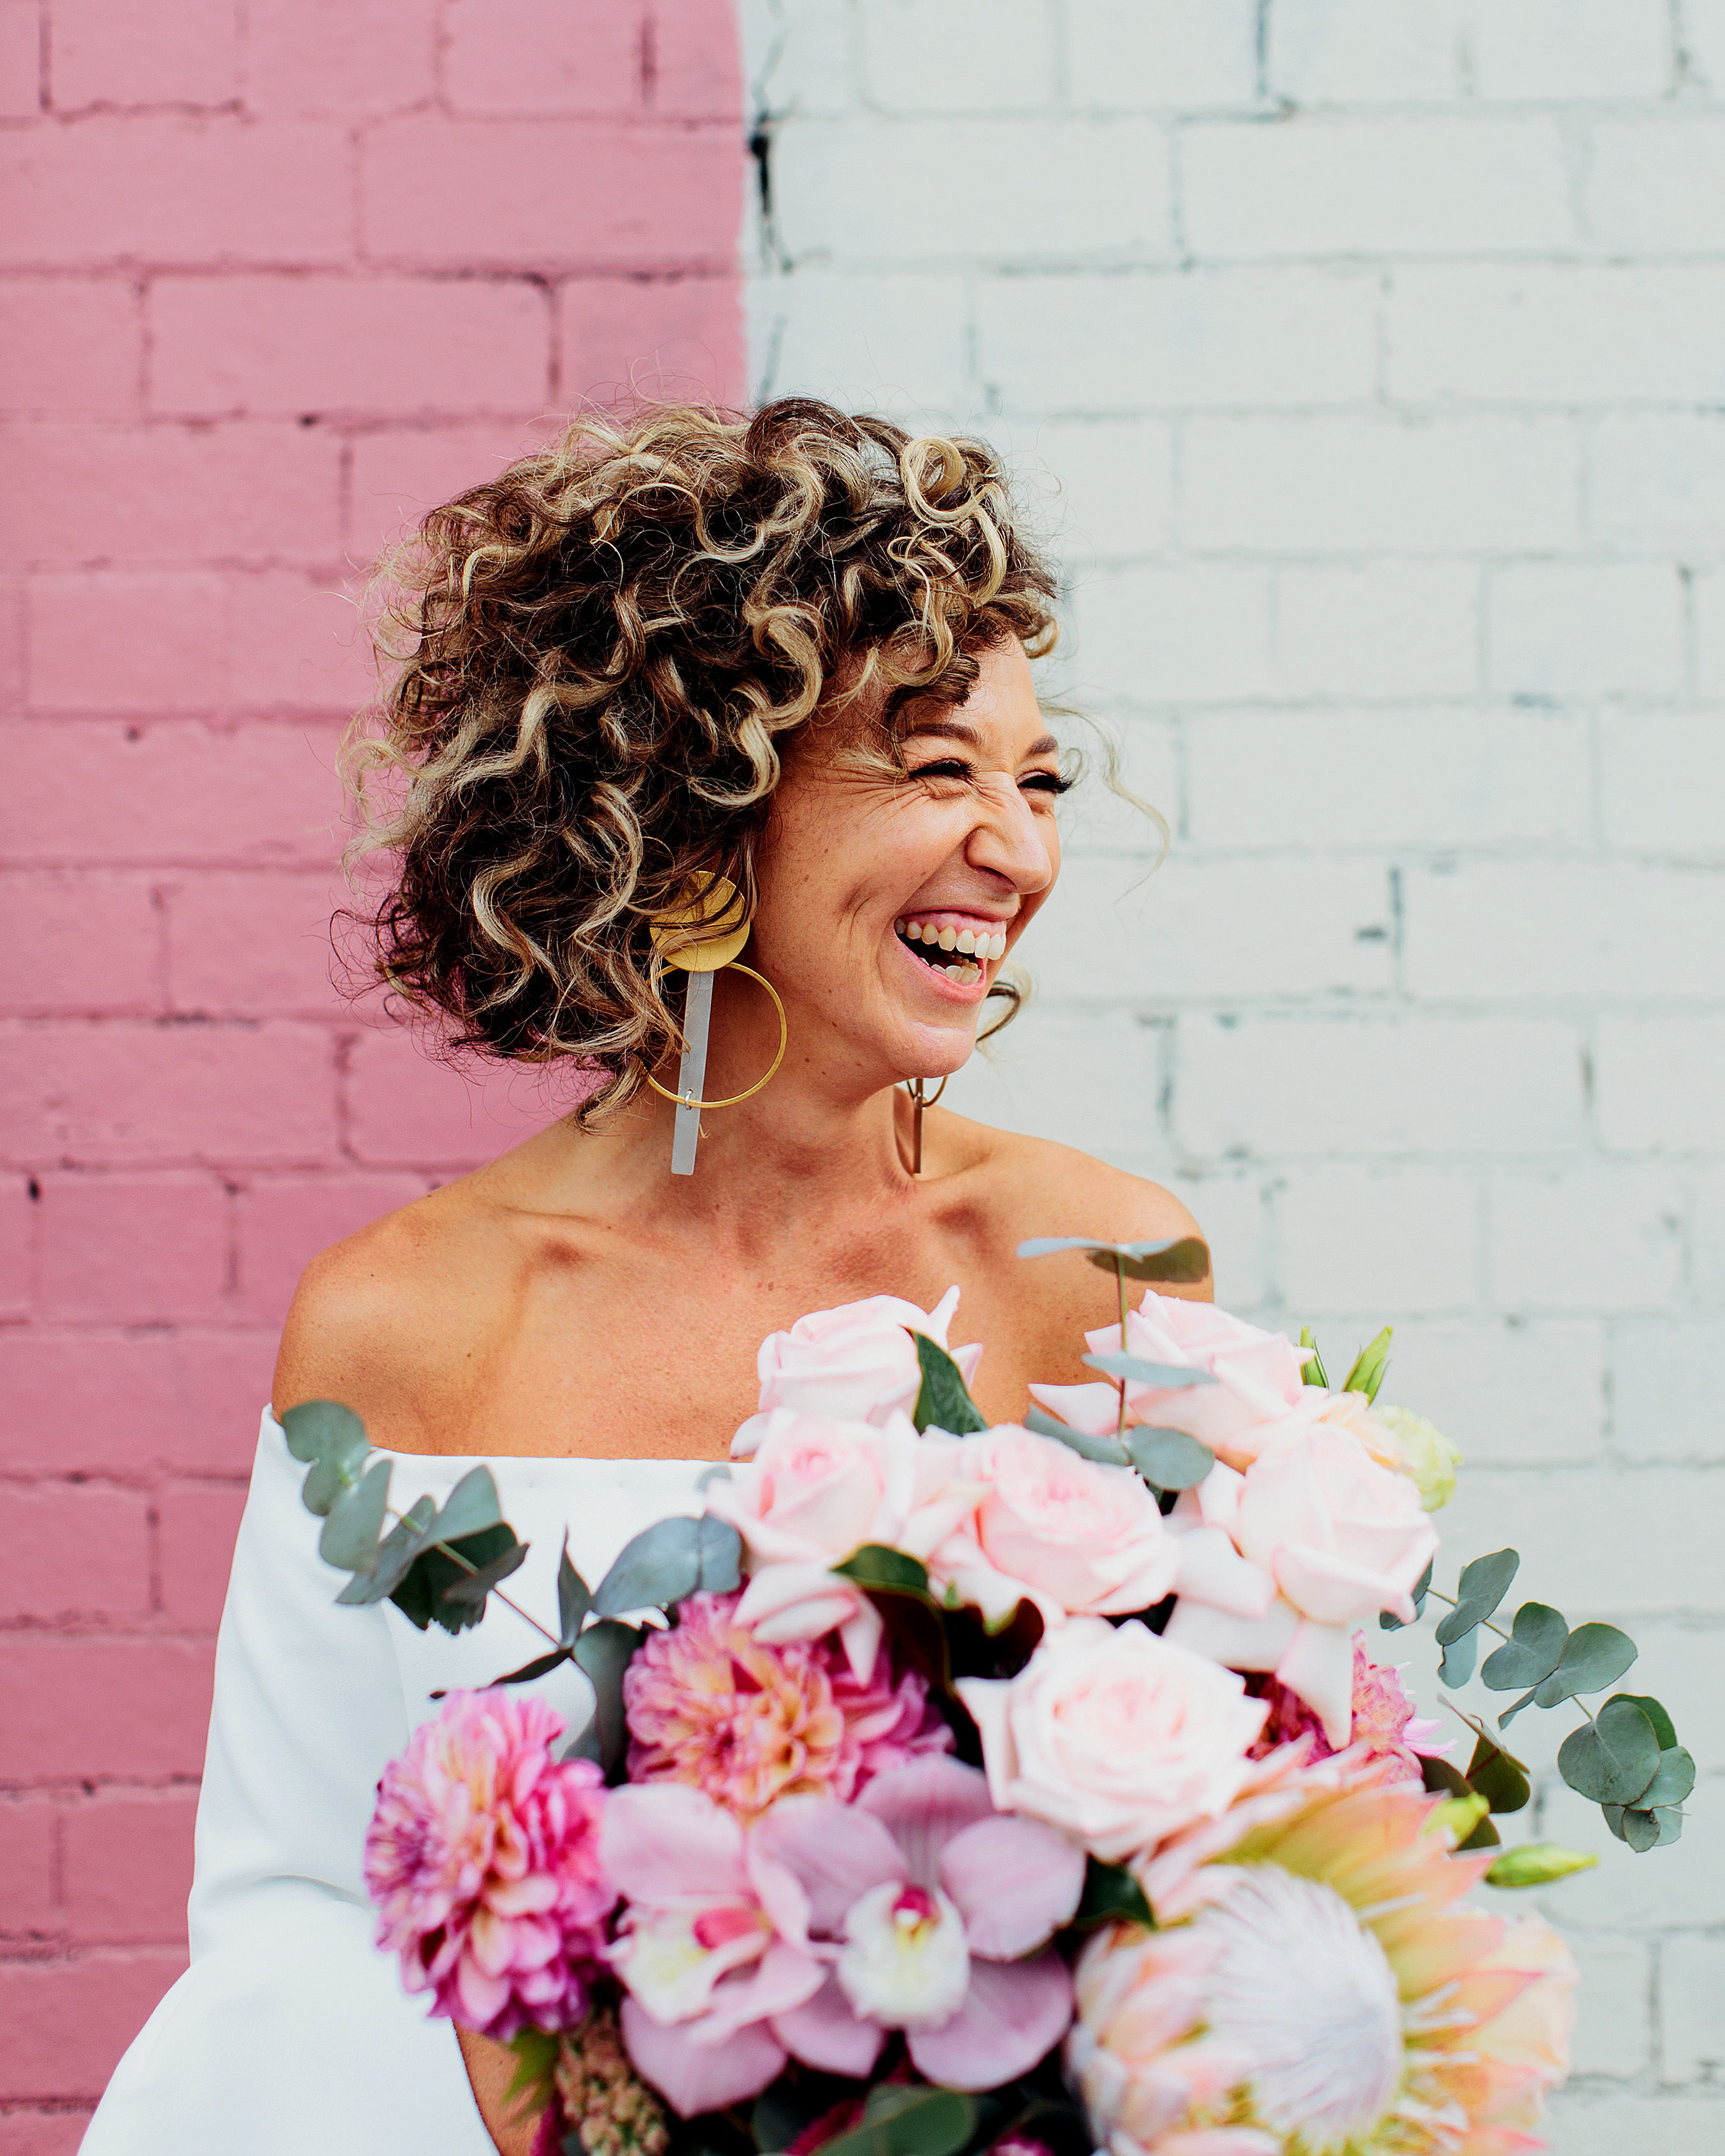 pink wedding ideas sayher heffernan